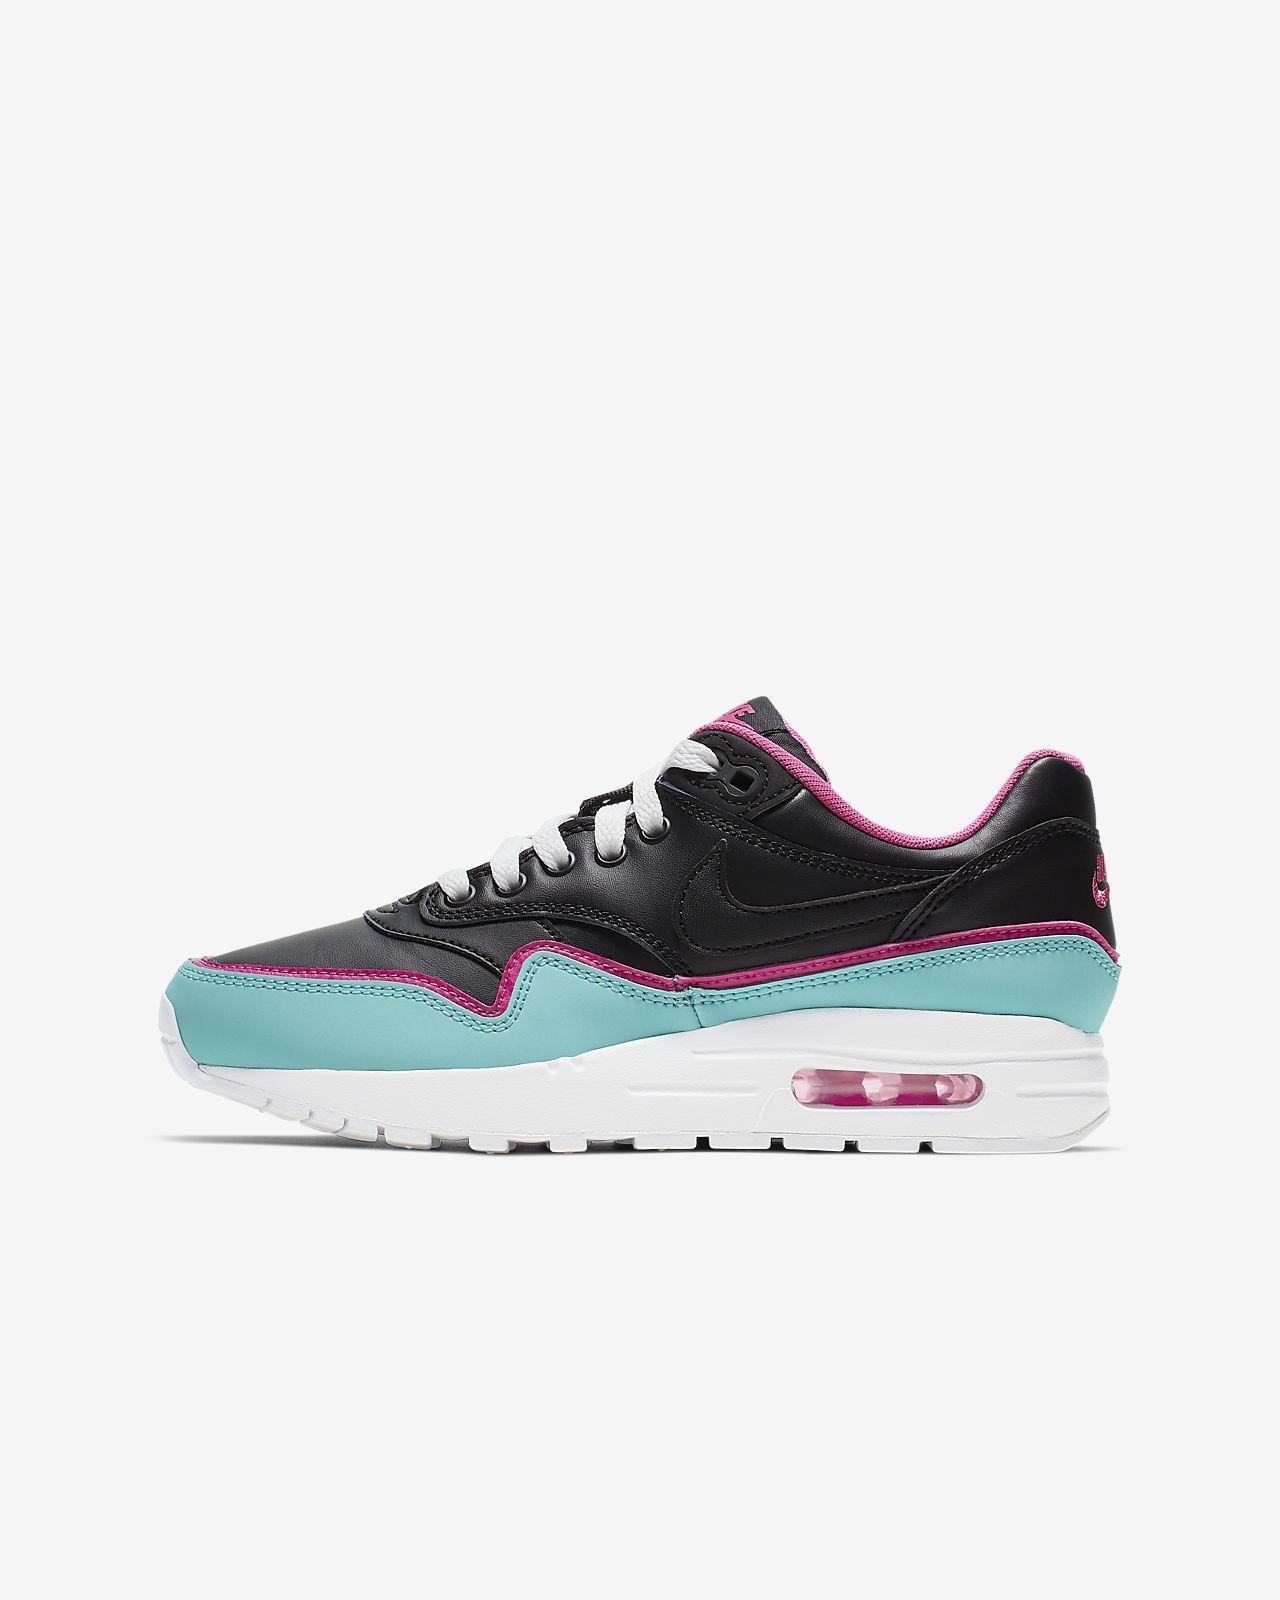 Nike Air Max 1 DBL Big Kids' Shoe